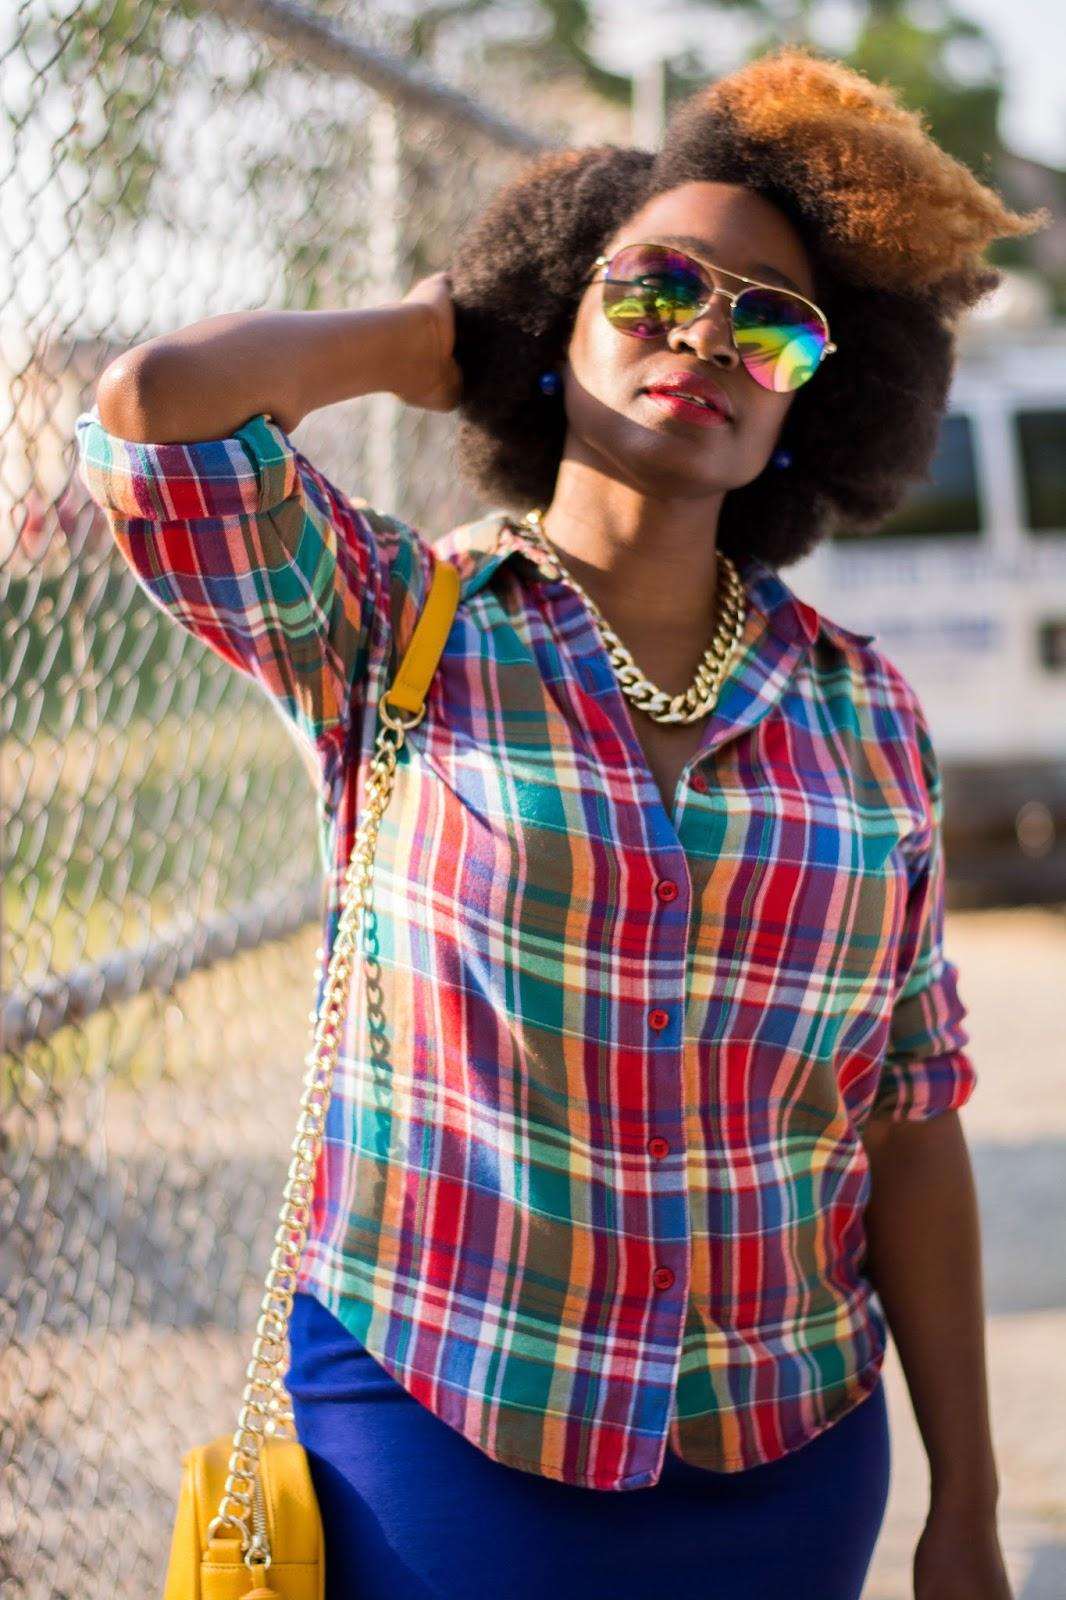 Atlanta style blogger, style blogger, Atlanta street style, Atlanta stylist, black girls rock, black blogger, black girls killing it, natural hair style, mirrored sunglasses, forever21 style, plaid shirt, shoedazzle, tassel handbag, mustard handbag, justfab, Atlanta style, Style influencer, Atlanta influencer, black girl magic, brown girl bloggers, black blogger, petite fashion, sneakers and skirts